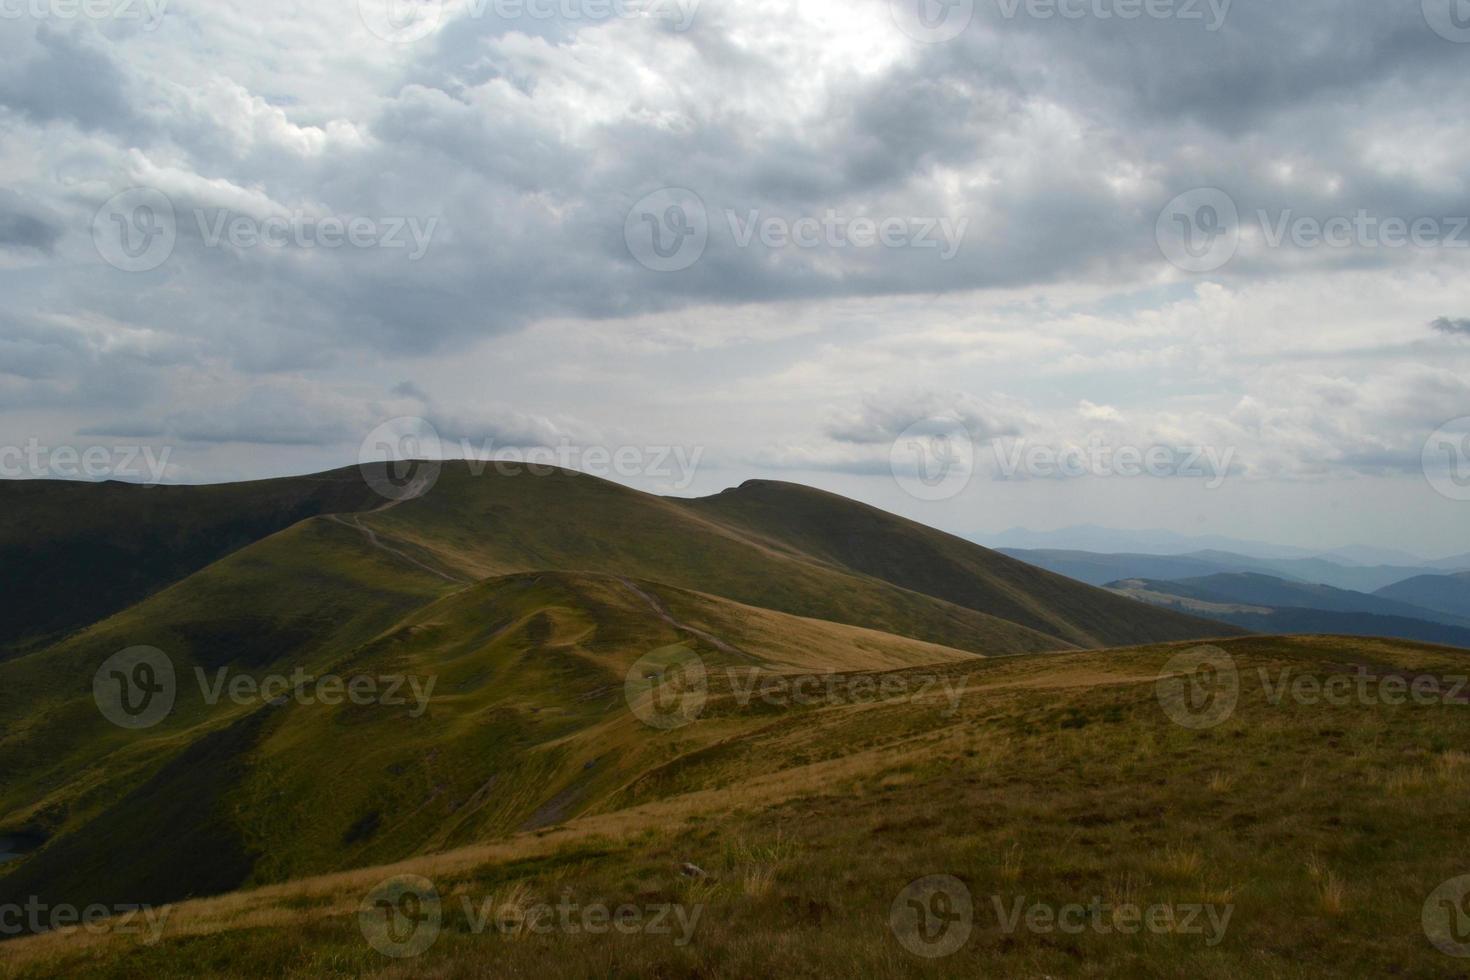 nuage montagnes ciel de voyage d'un panorama photo